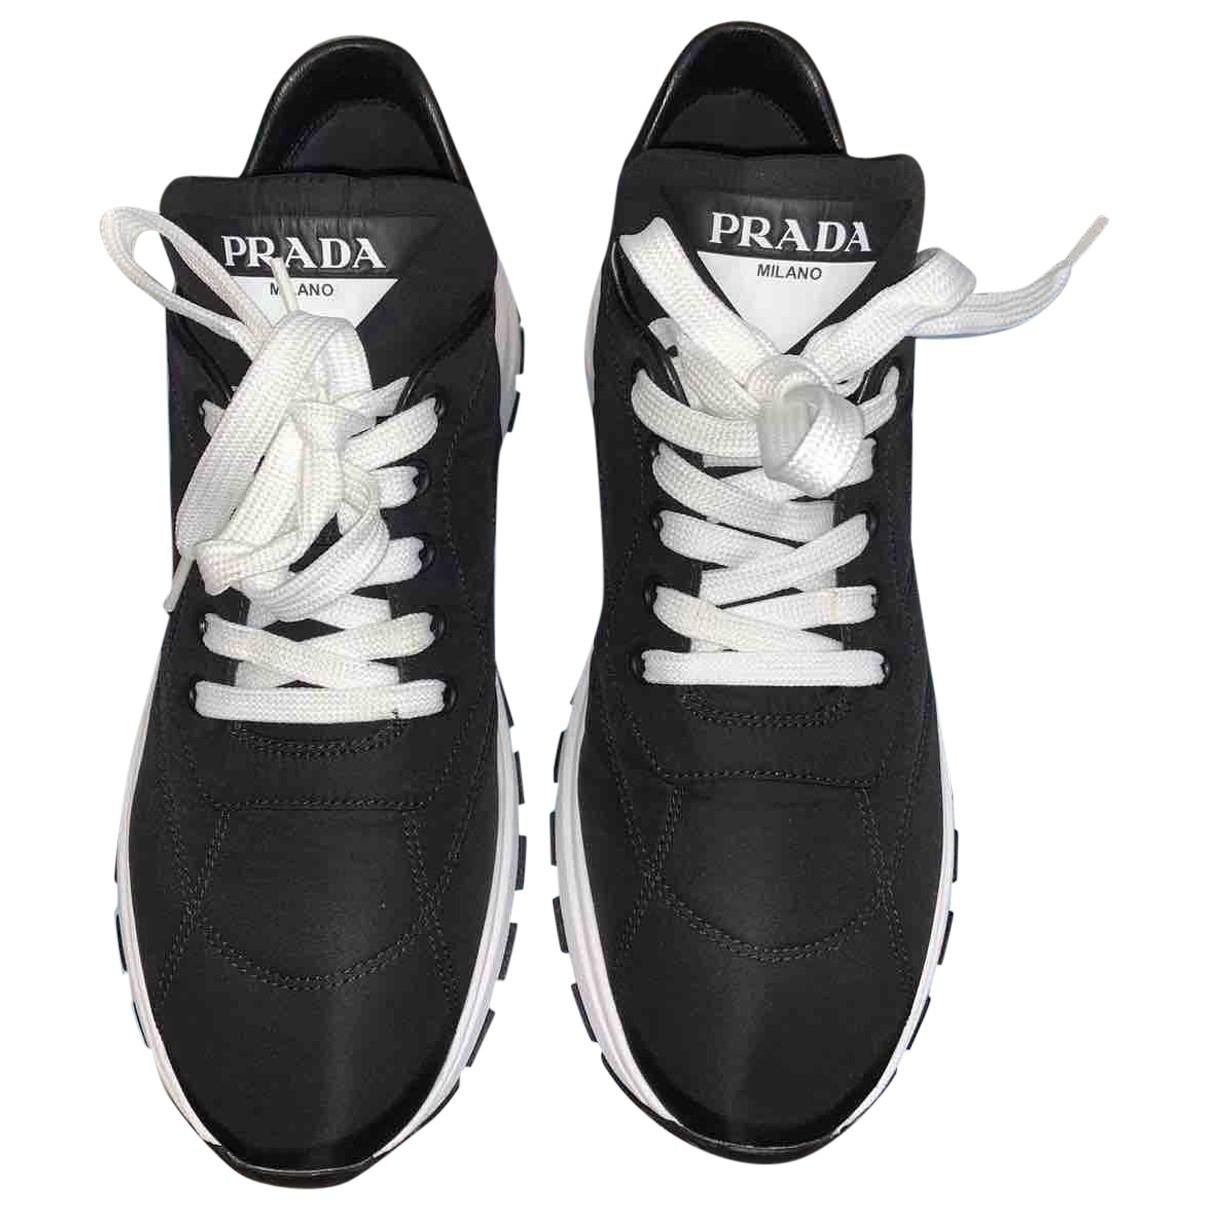 Prada \N Sneakers in  Schwarz Leinen